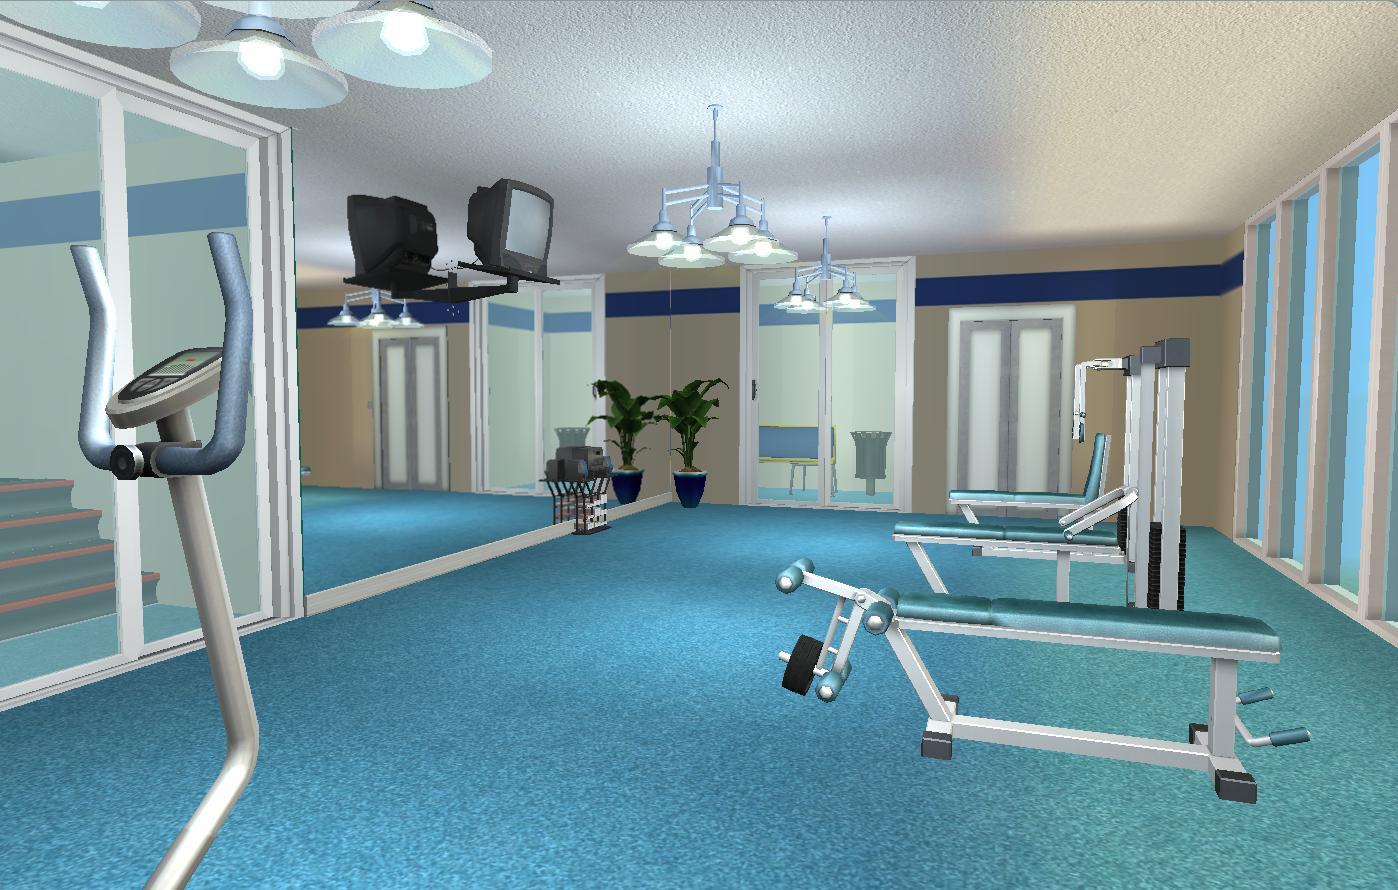 Mod the sims adrenaline gymnasium cityville series